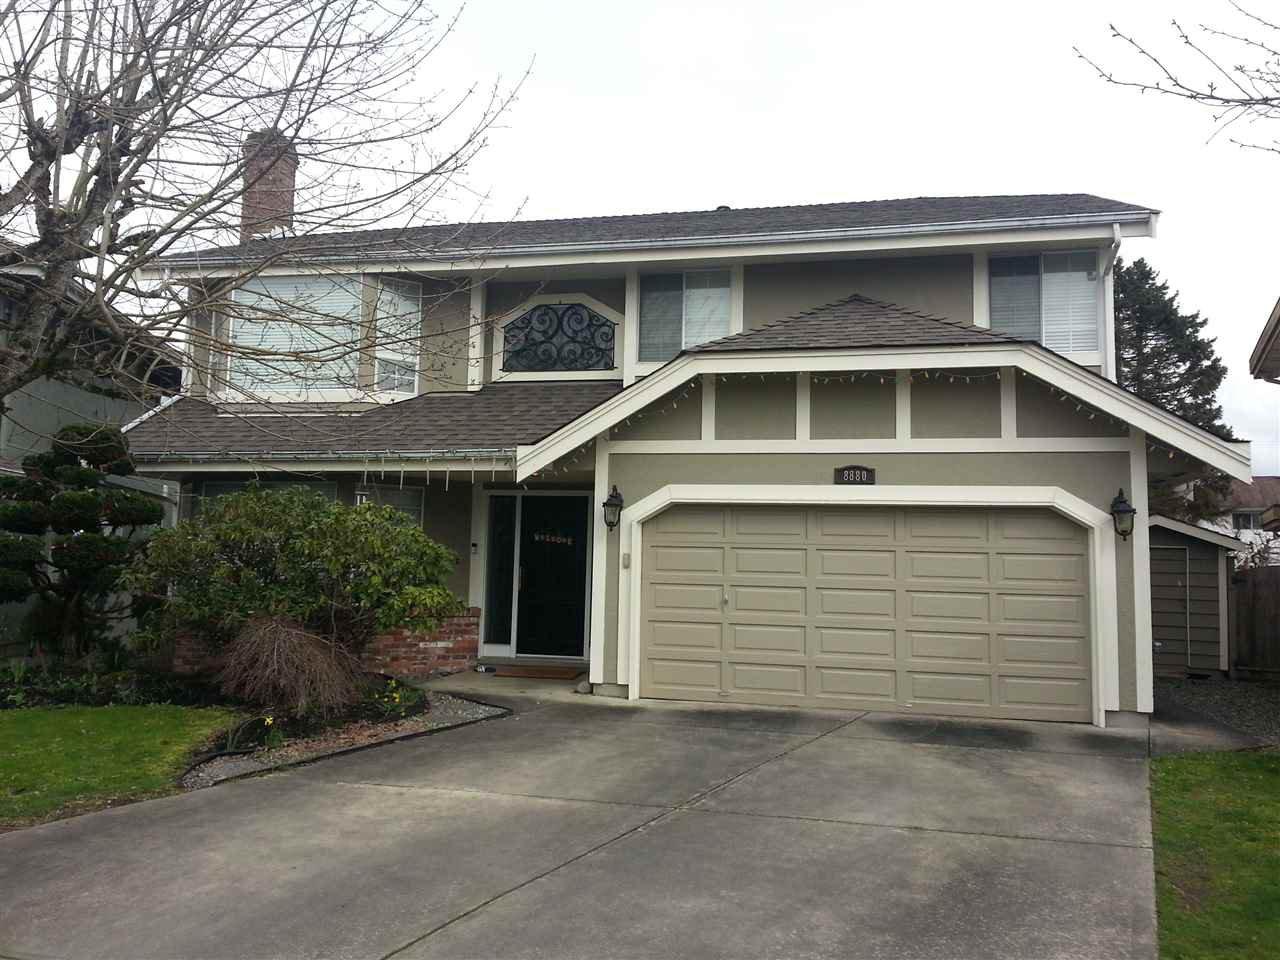 Main Photo: 8880 ALLISON STREET in : Garden City House for sale : MLS®# R2043478